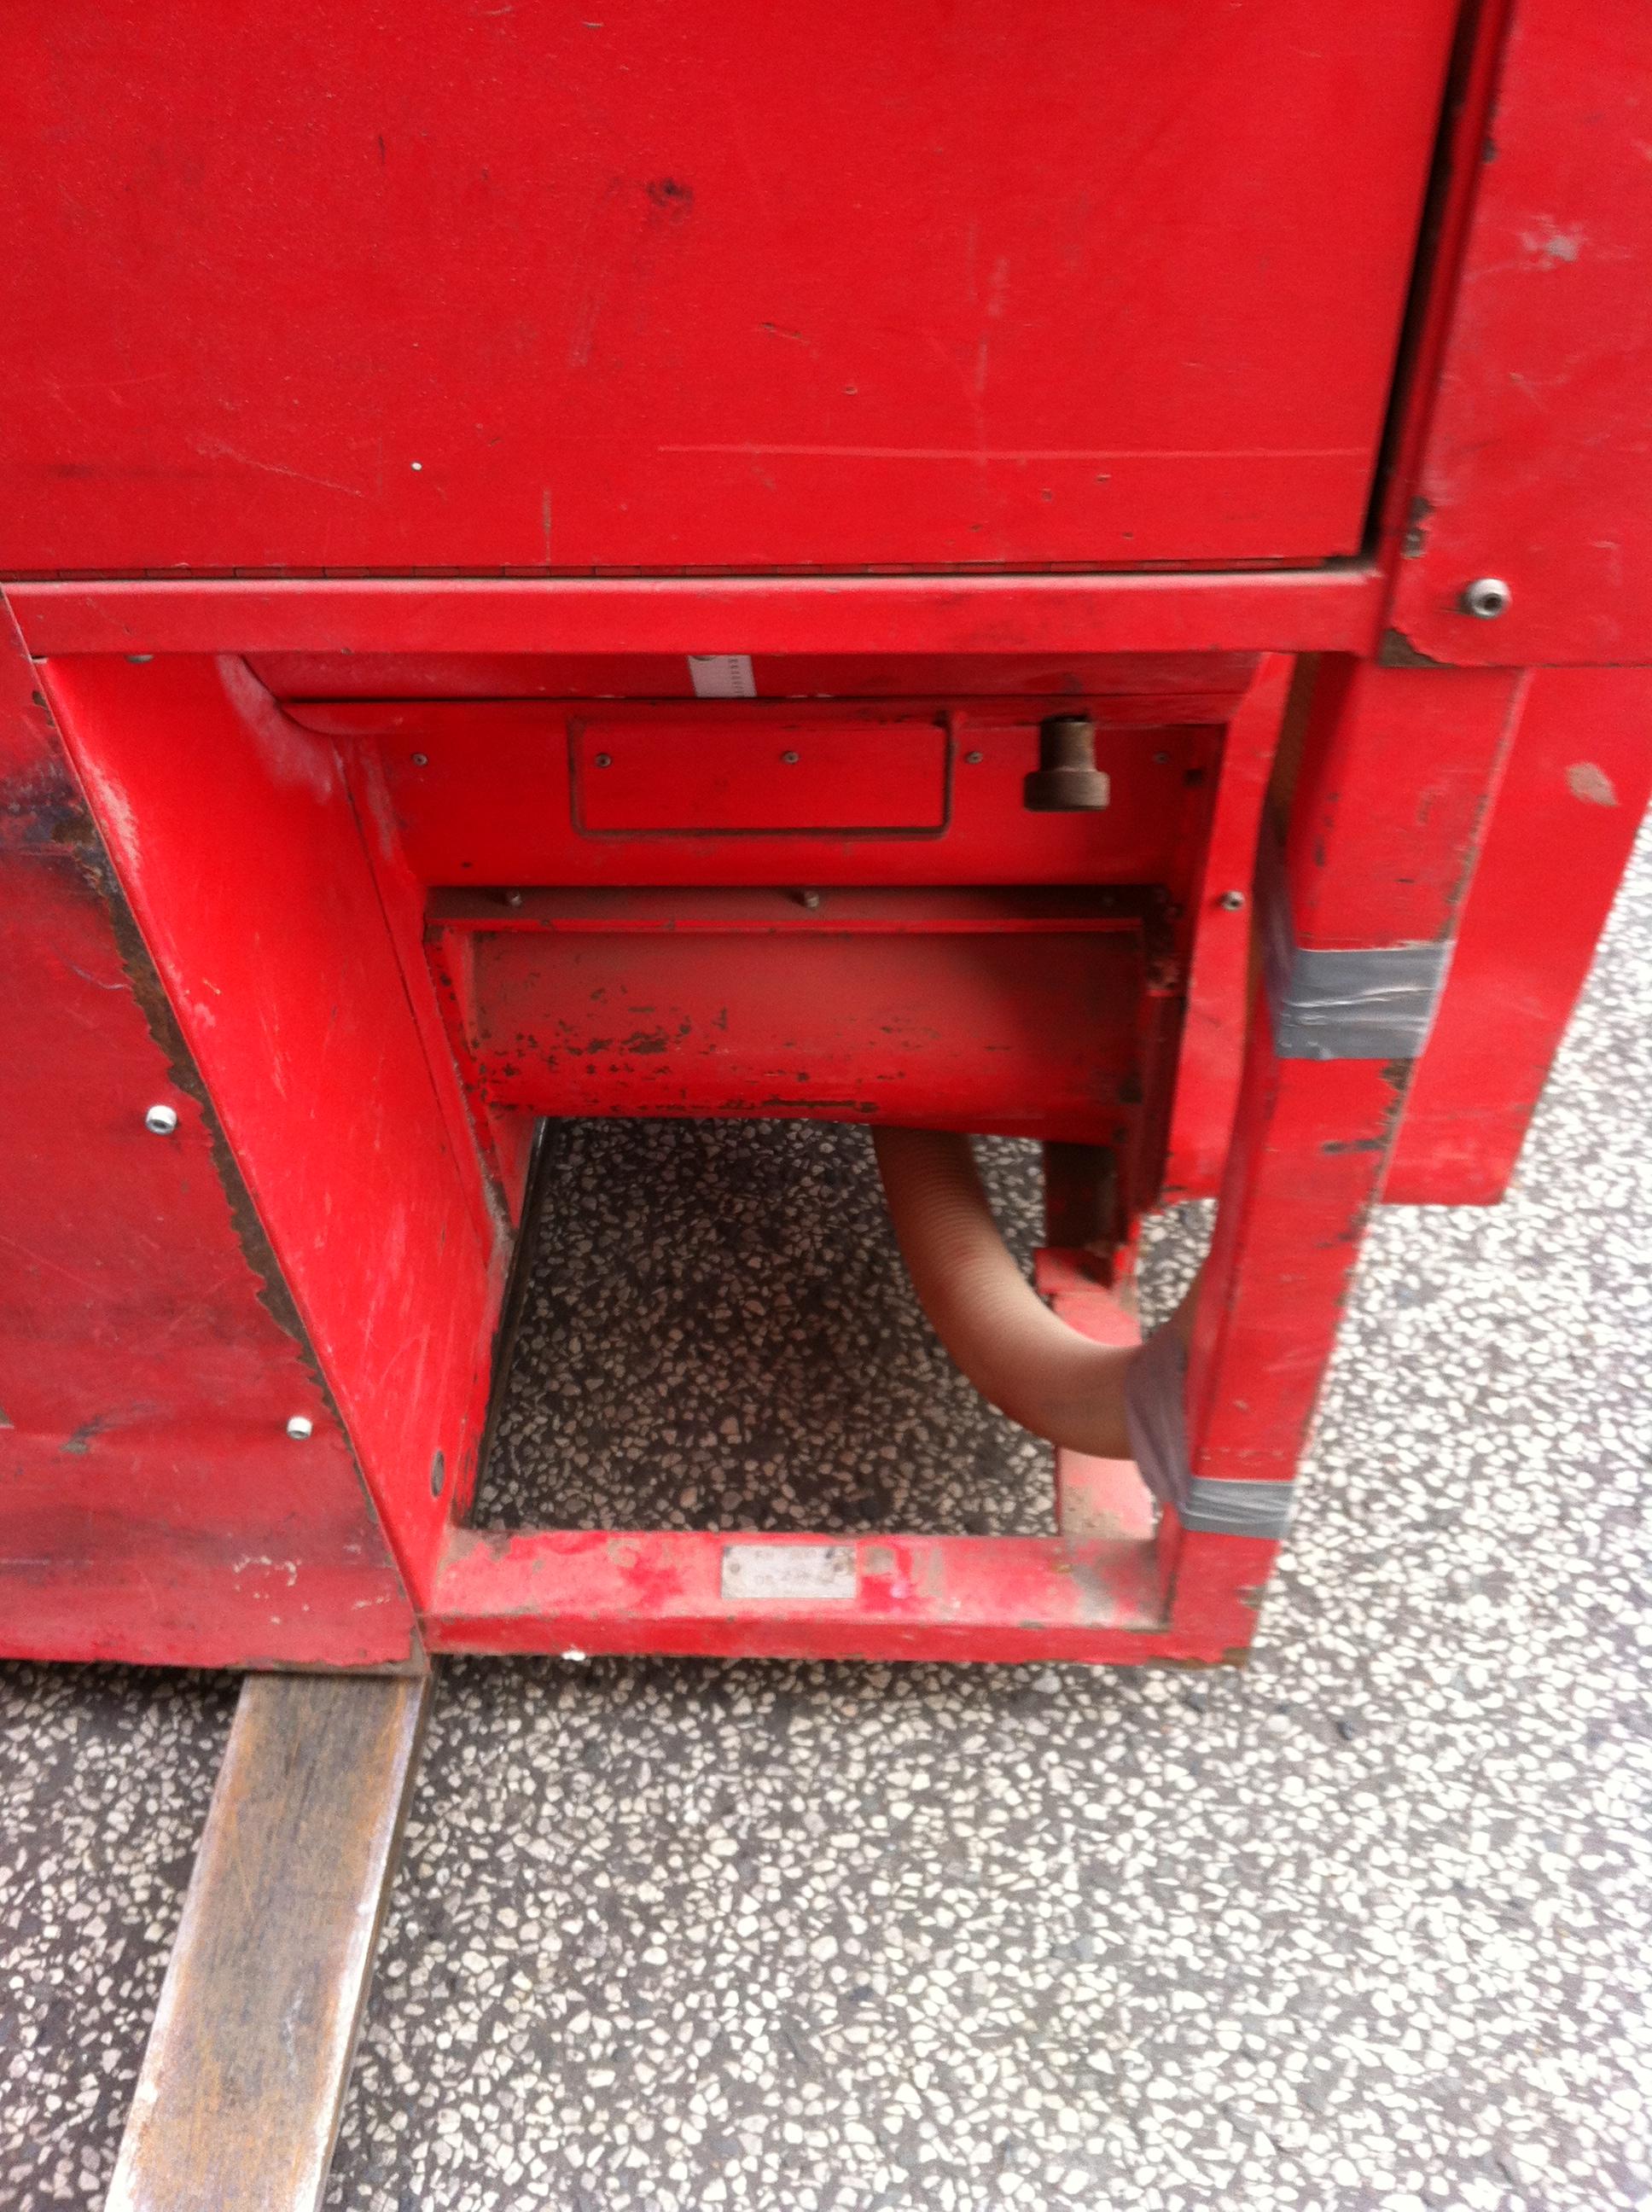 Stuart Energy Cavity Wall Insulation Machine - SE500/CH454 - Image 2 of 3